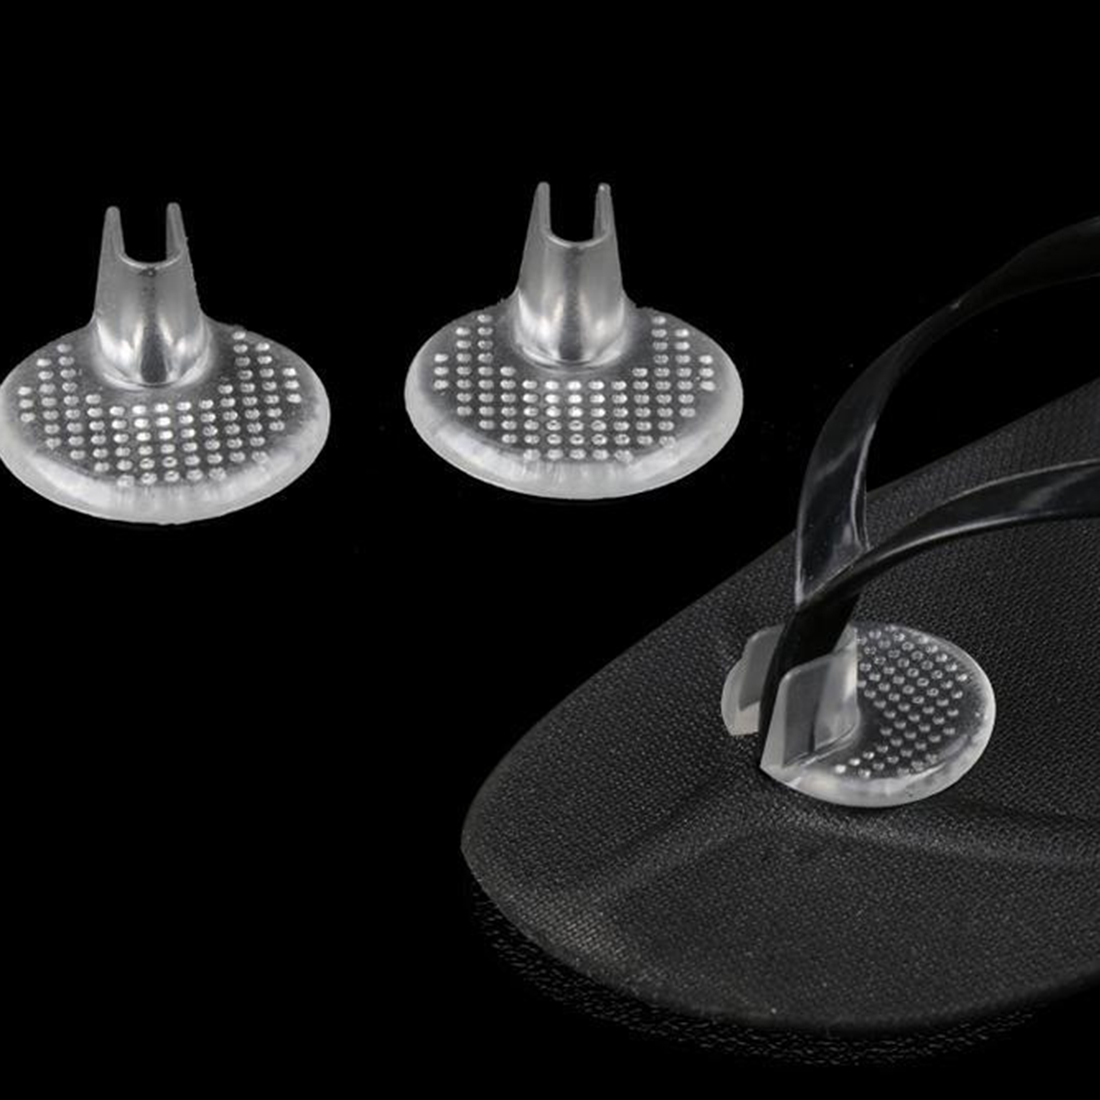 Hot-Gel Inserts Cushions Flip Flop Sandal Insoles 1 Pair